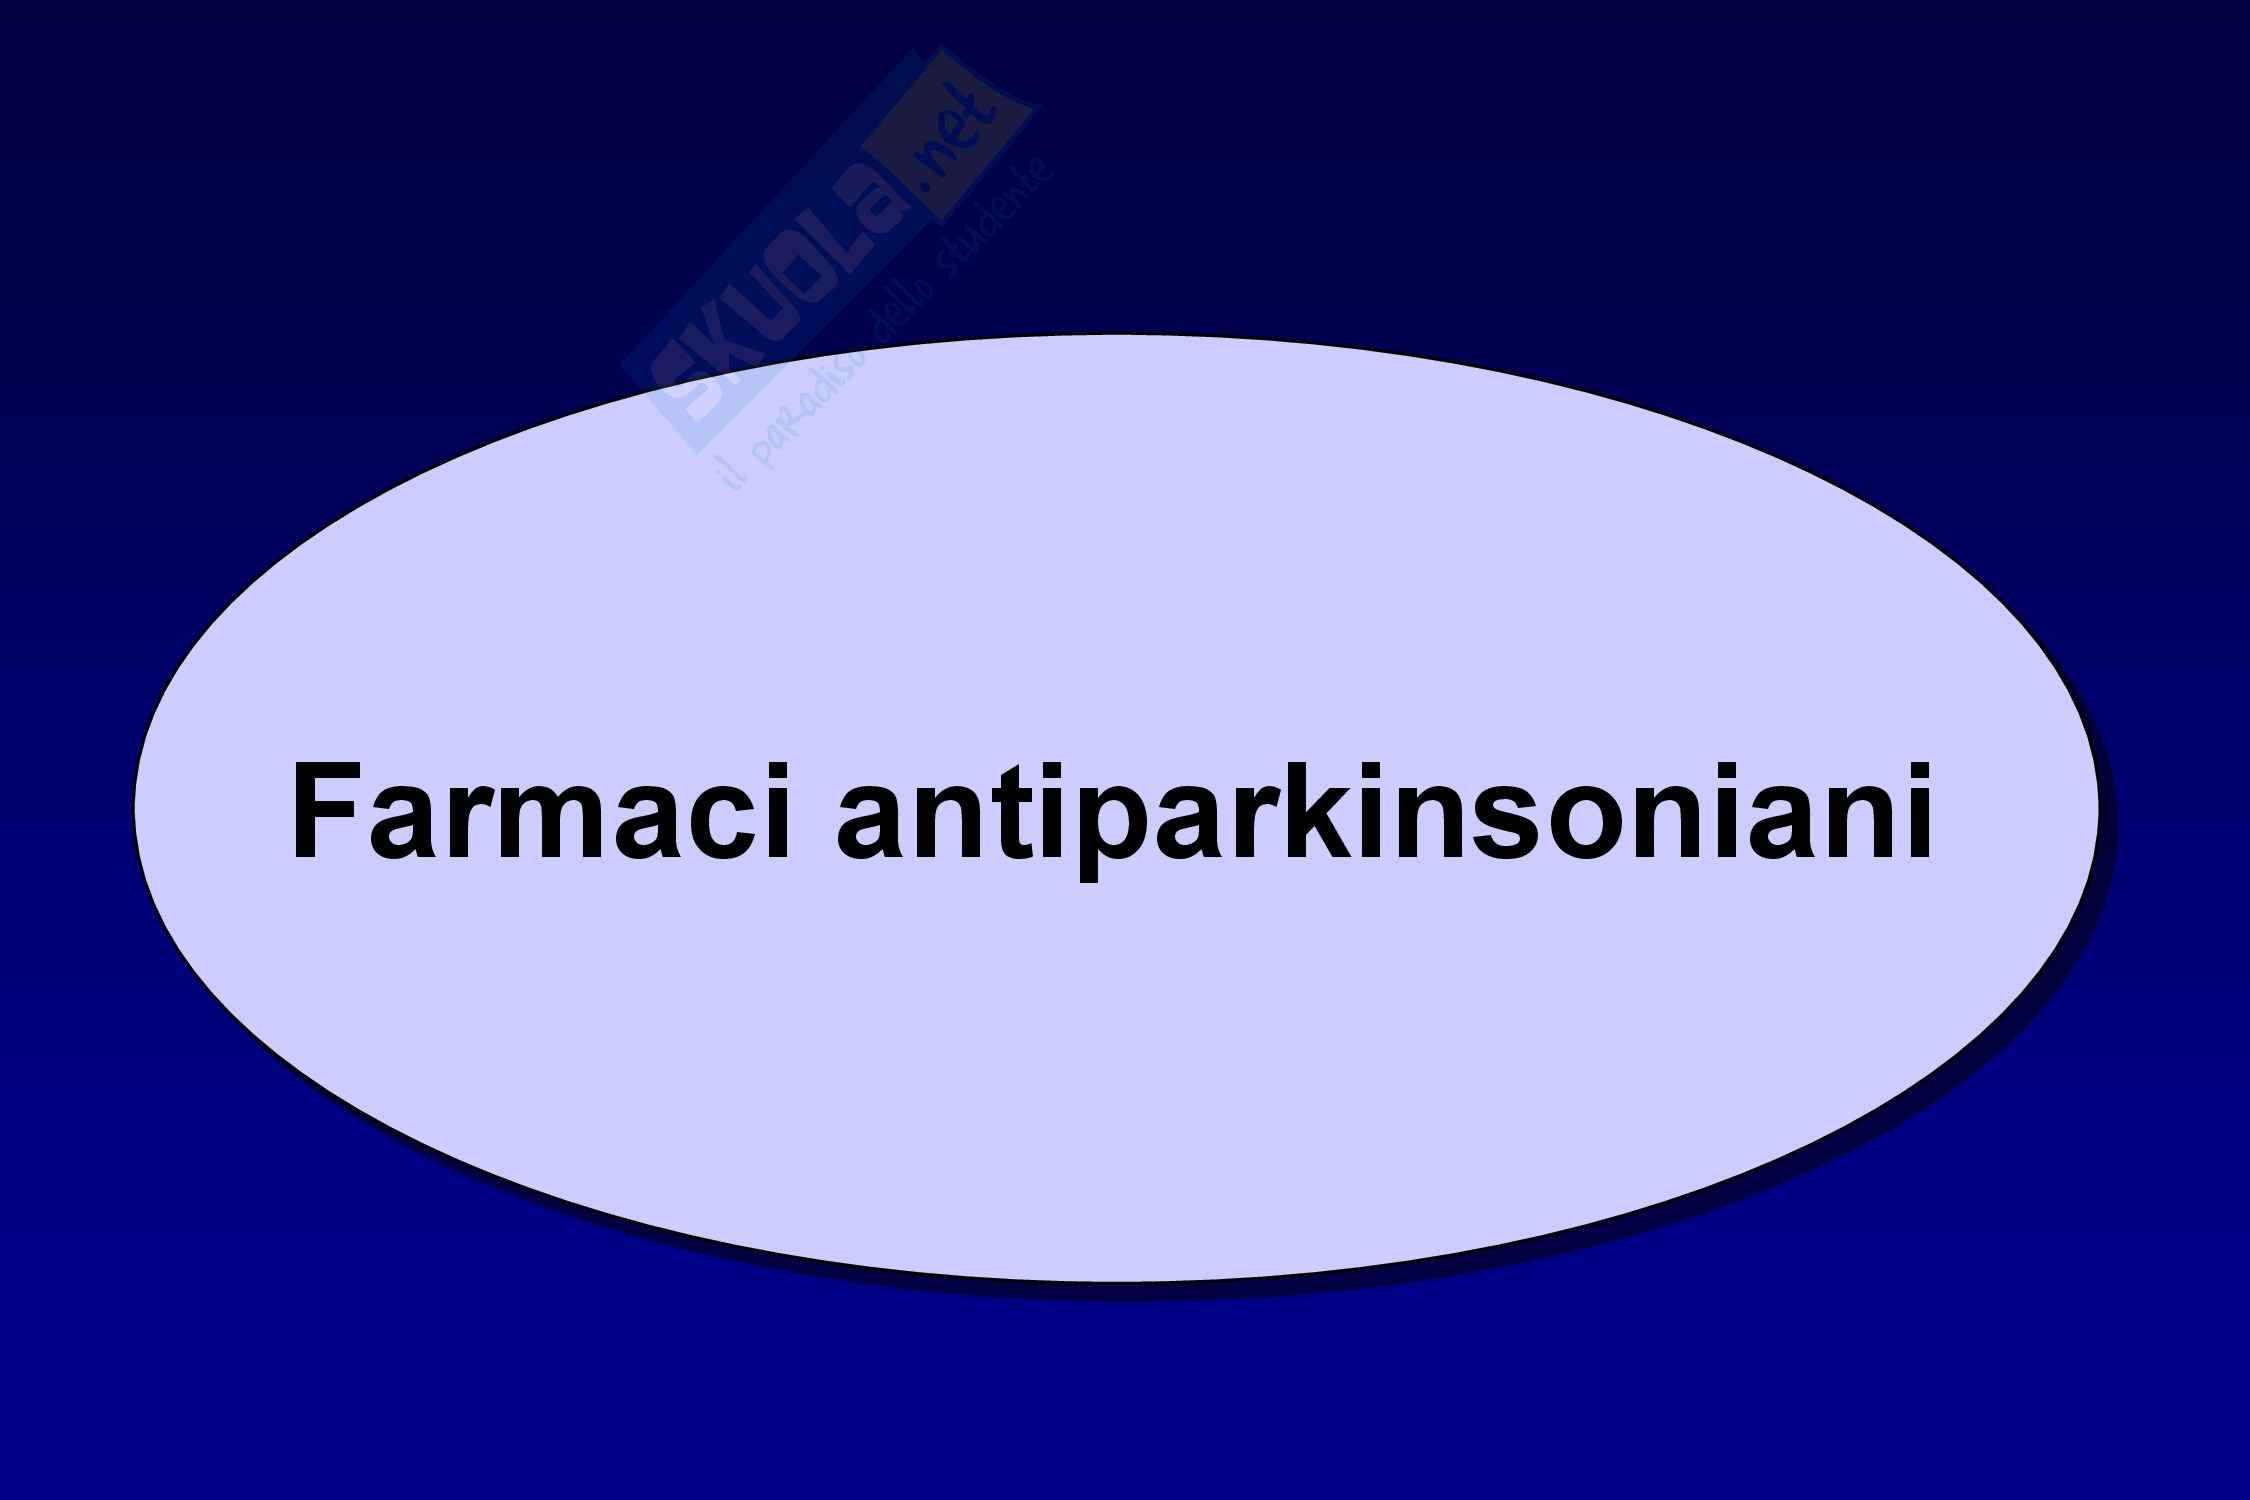 Farmaci antiparkinson